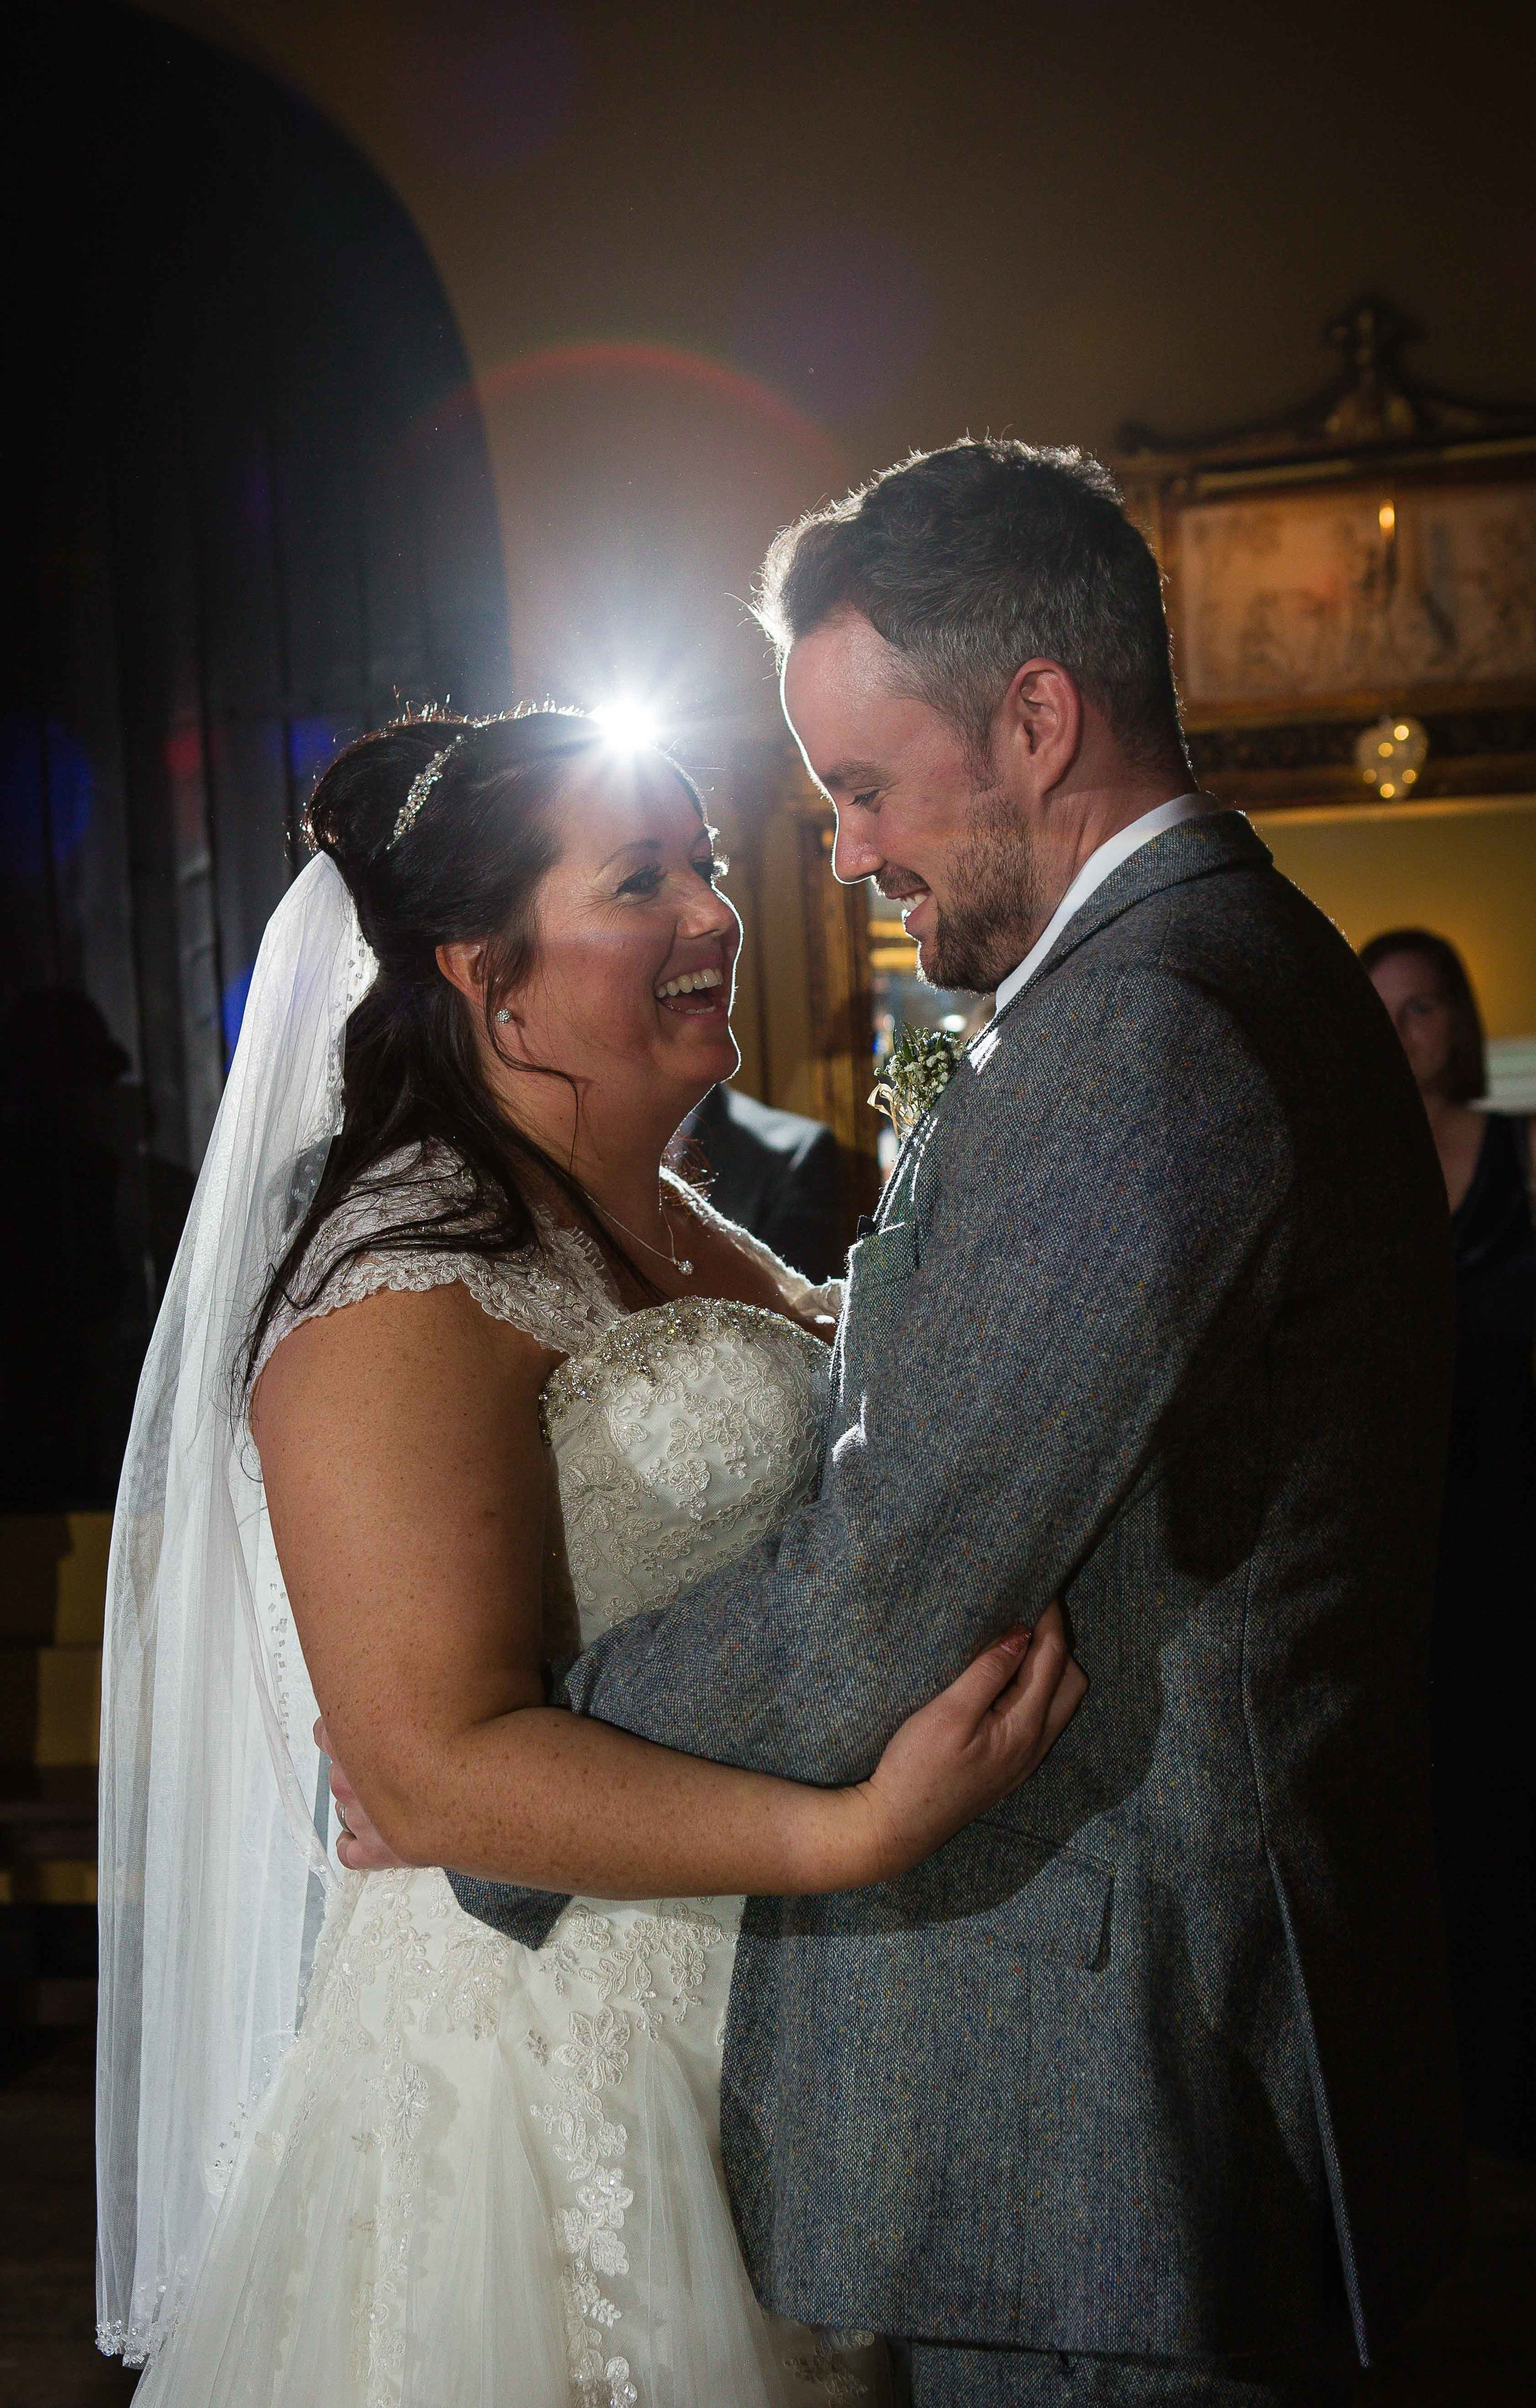 14.02.17 - Matt-Faye-Coombe-Abbey-Valentine-Wedding-Charnwood-Photography-1094.jpg